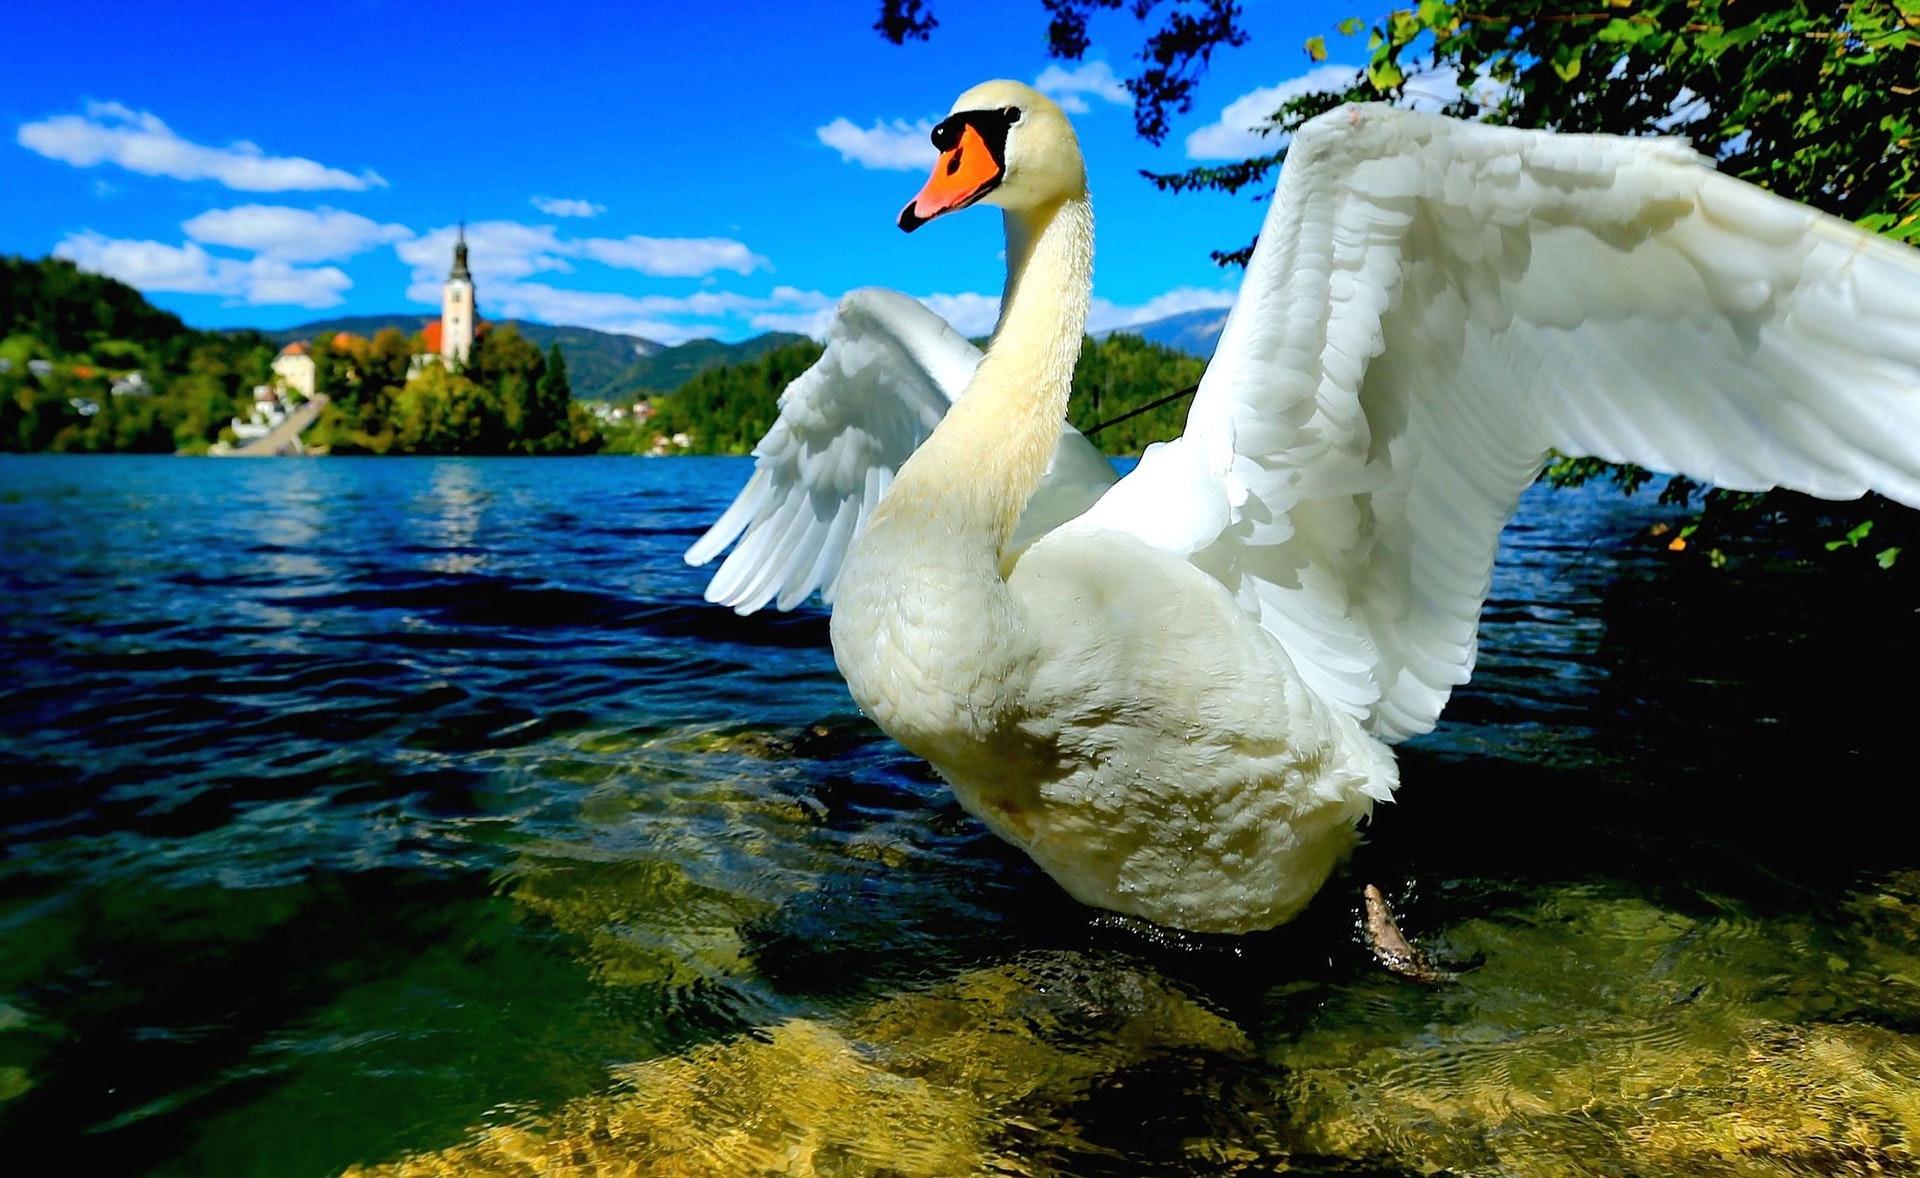 slovenia swan lake bled